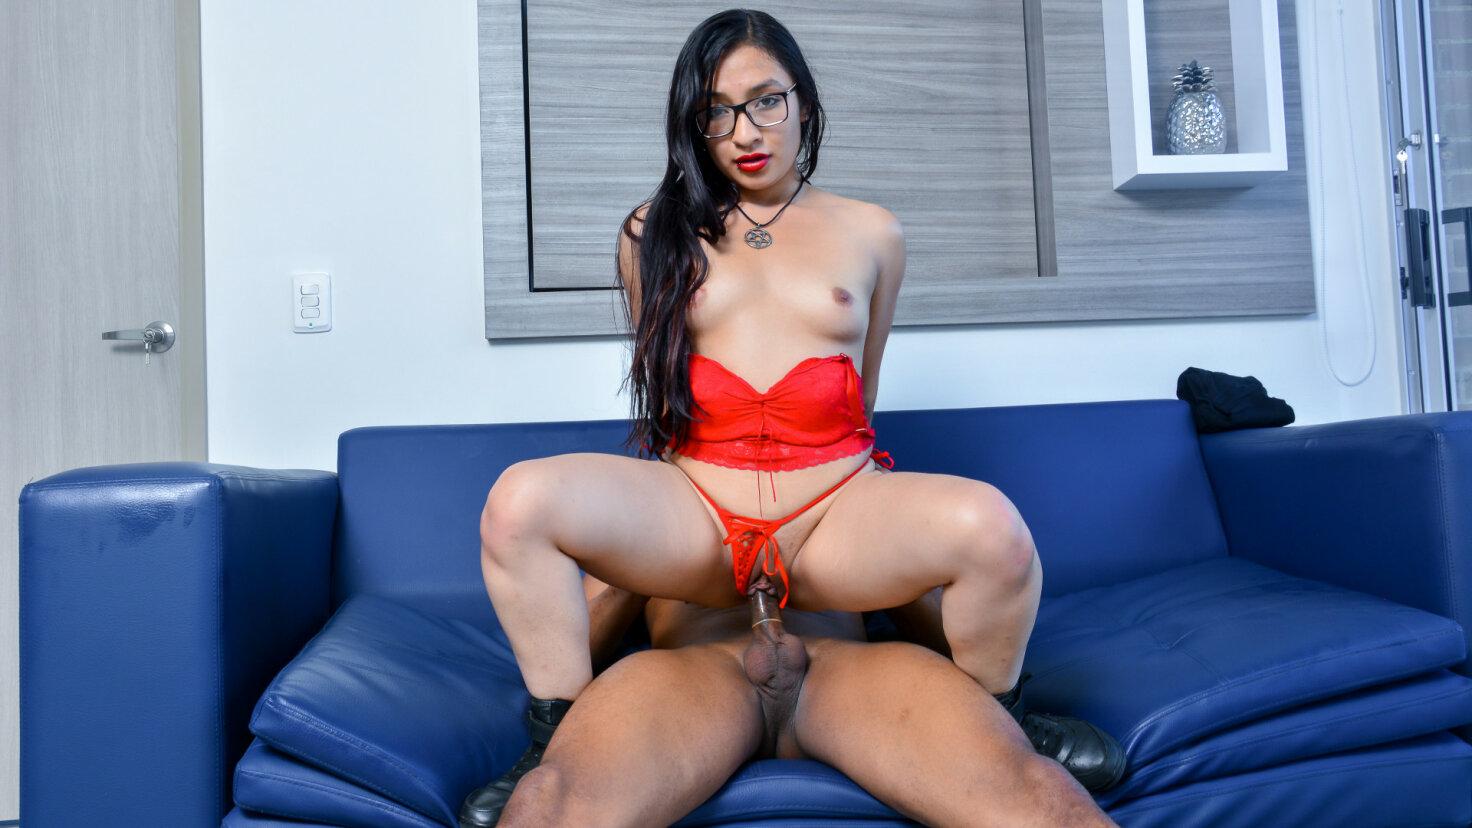 Sweet Latina Eva Cuervo gets cum on her glasses in hot pickup and fuck - Carne del Mercado